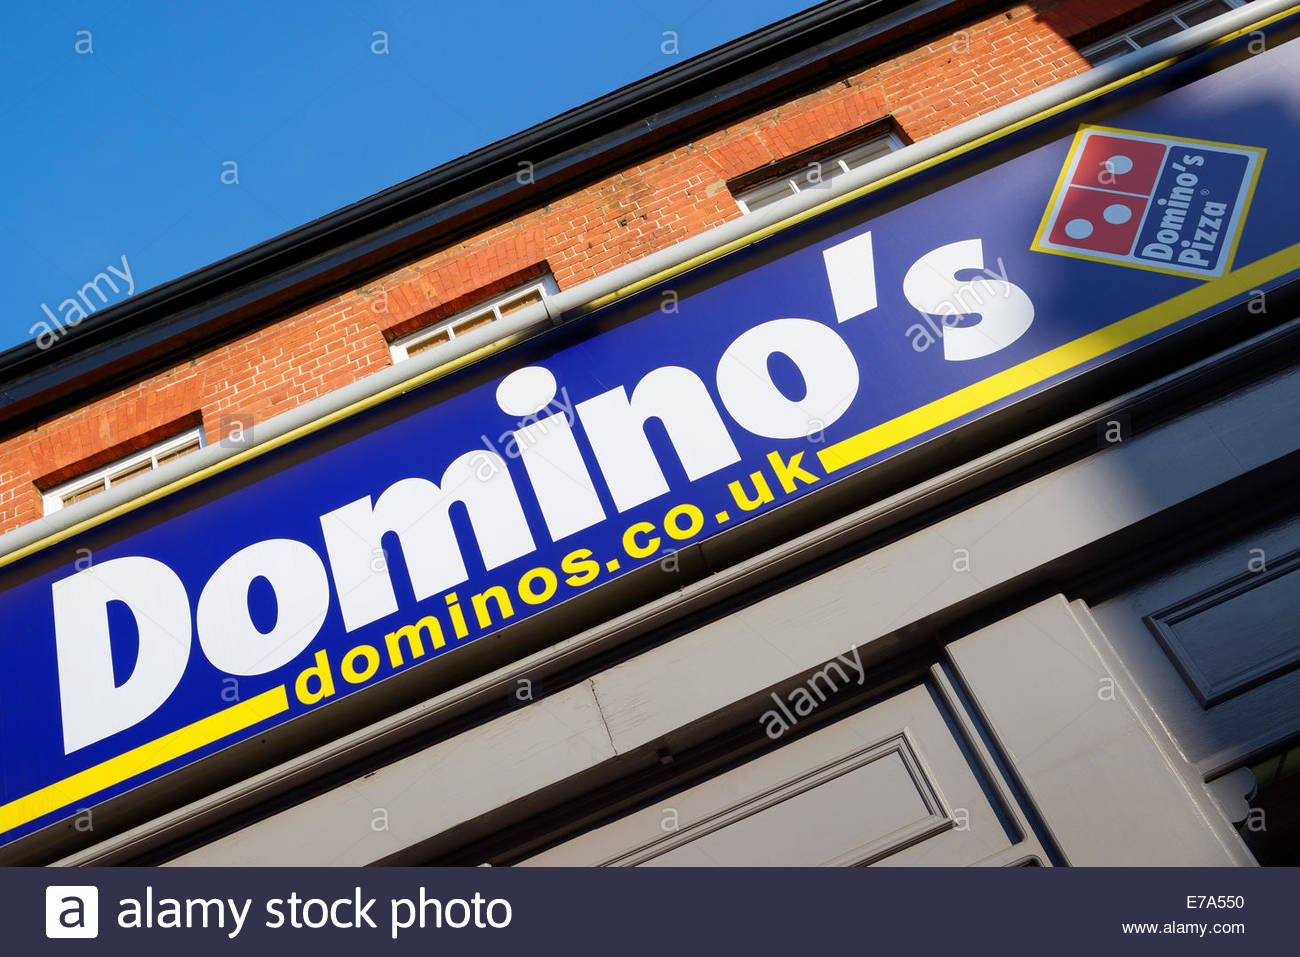 recipe: dominos dorking [7]